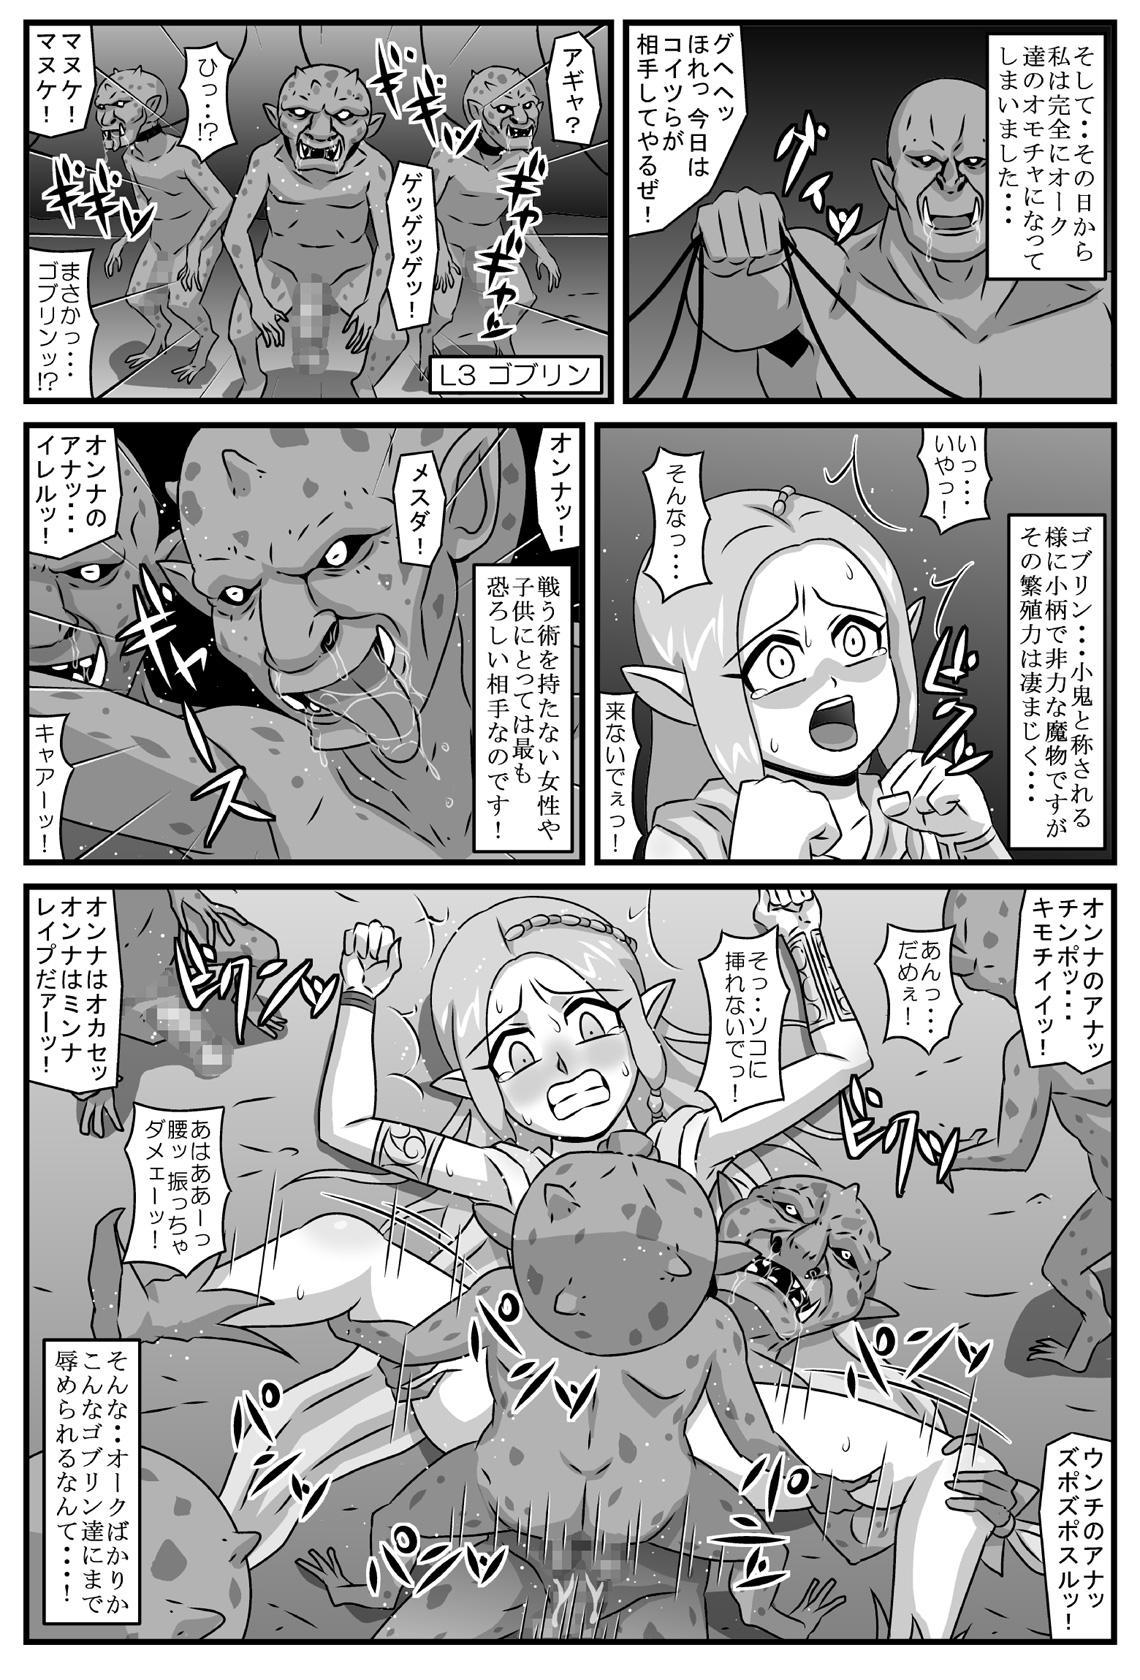 Elf Rinkan ~Kijin-tachi no Seien 16